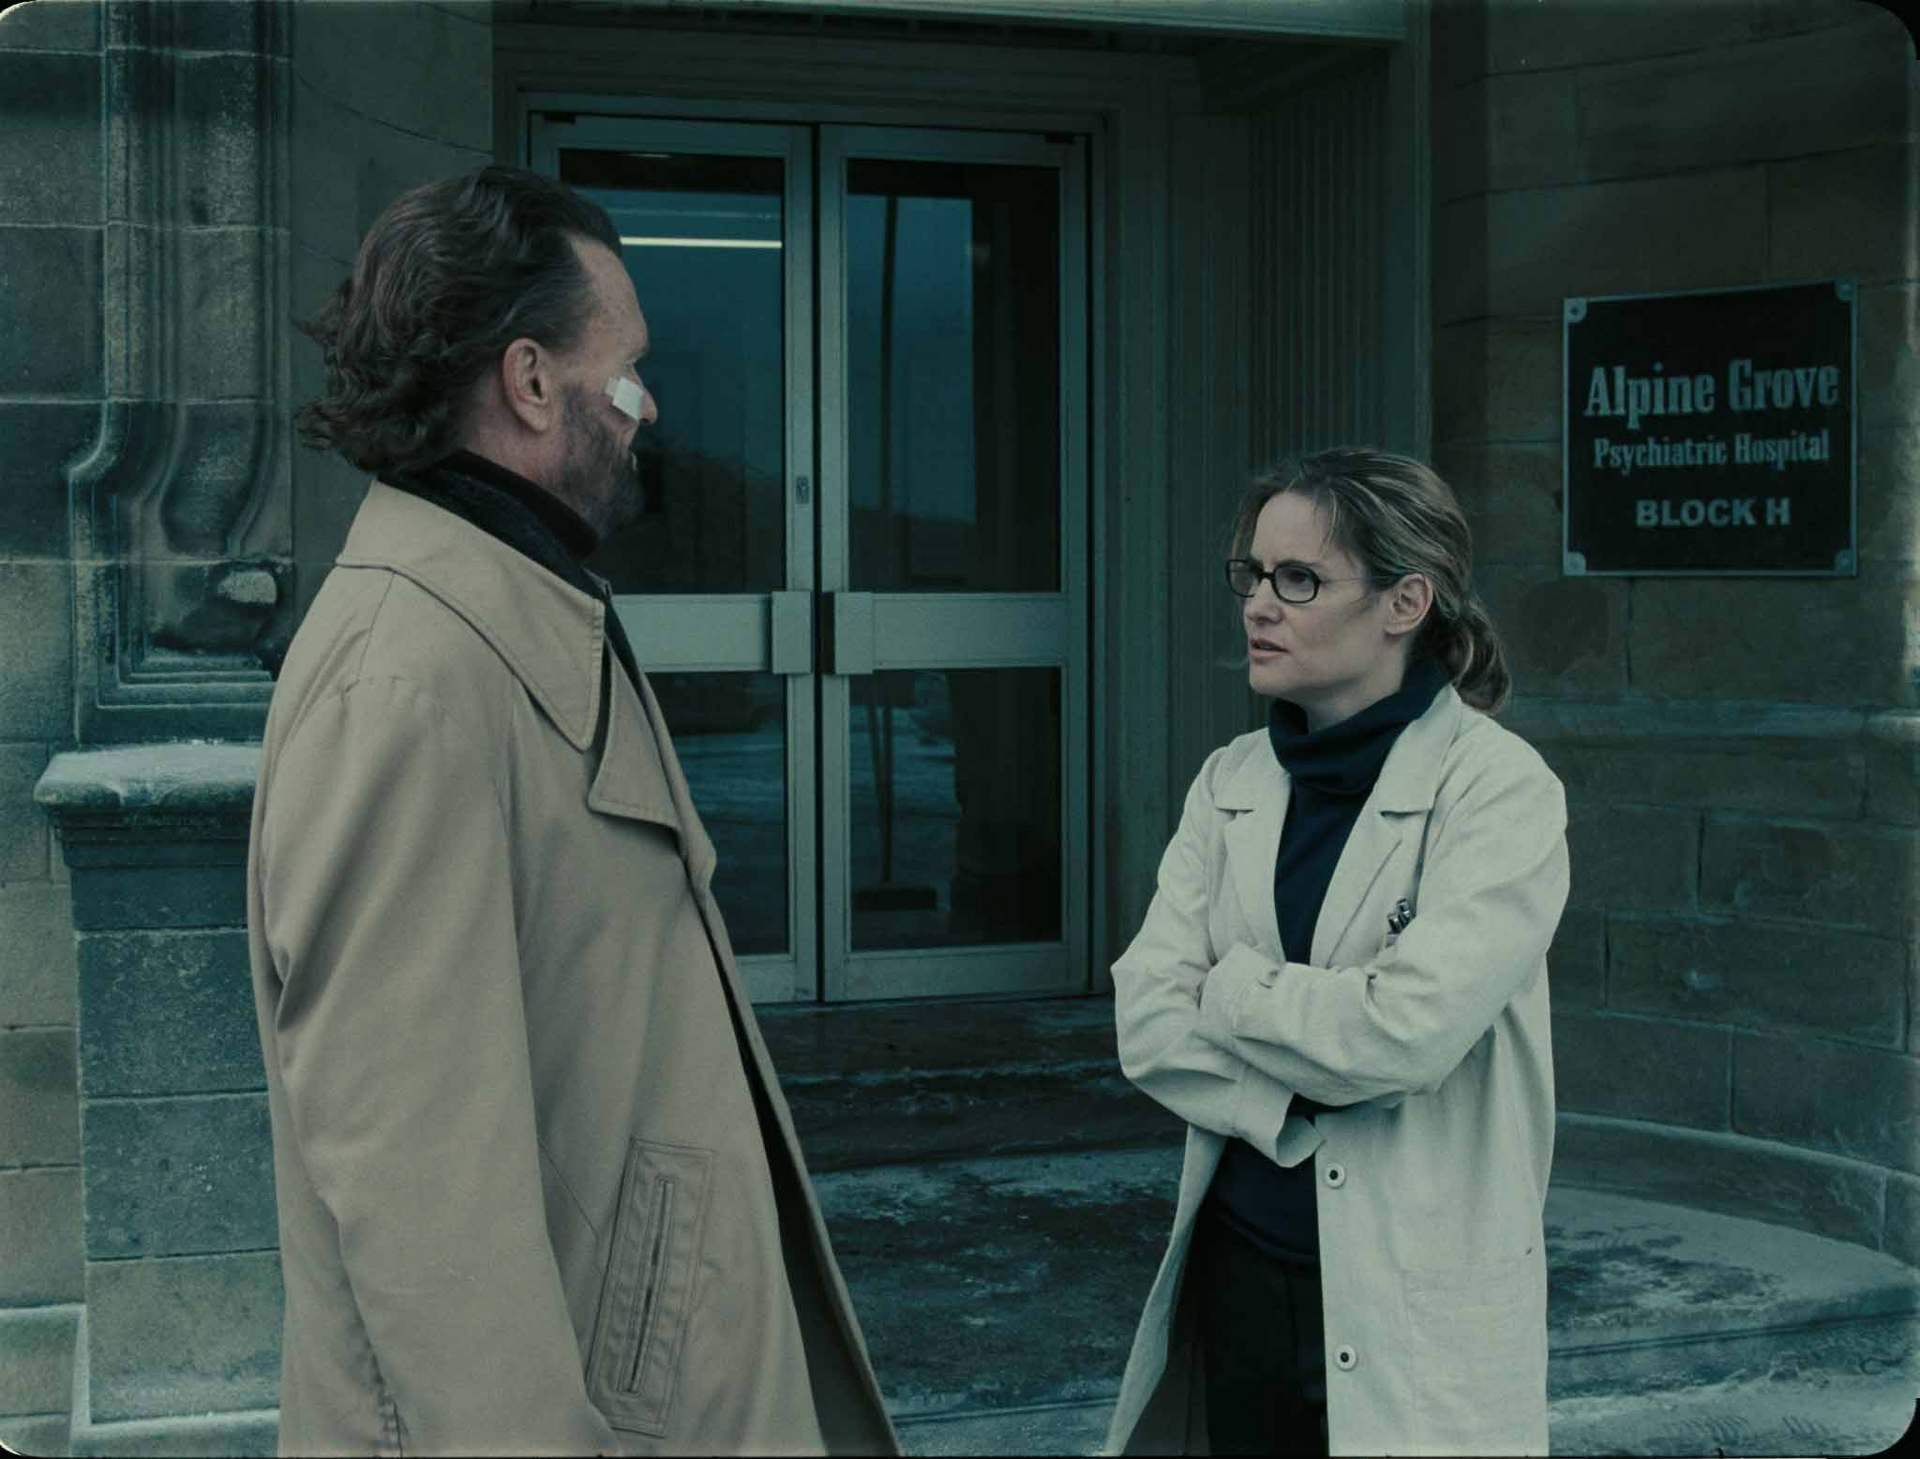 The chaqueta